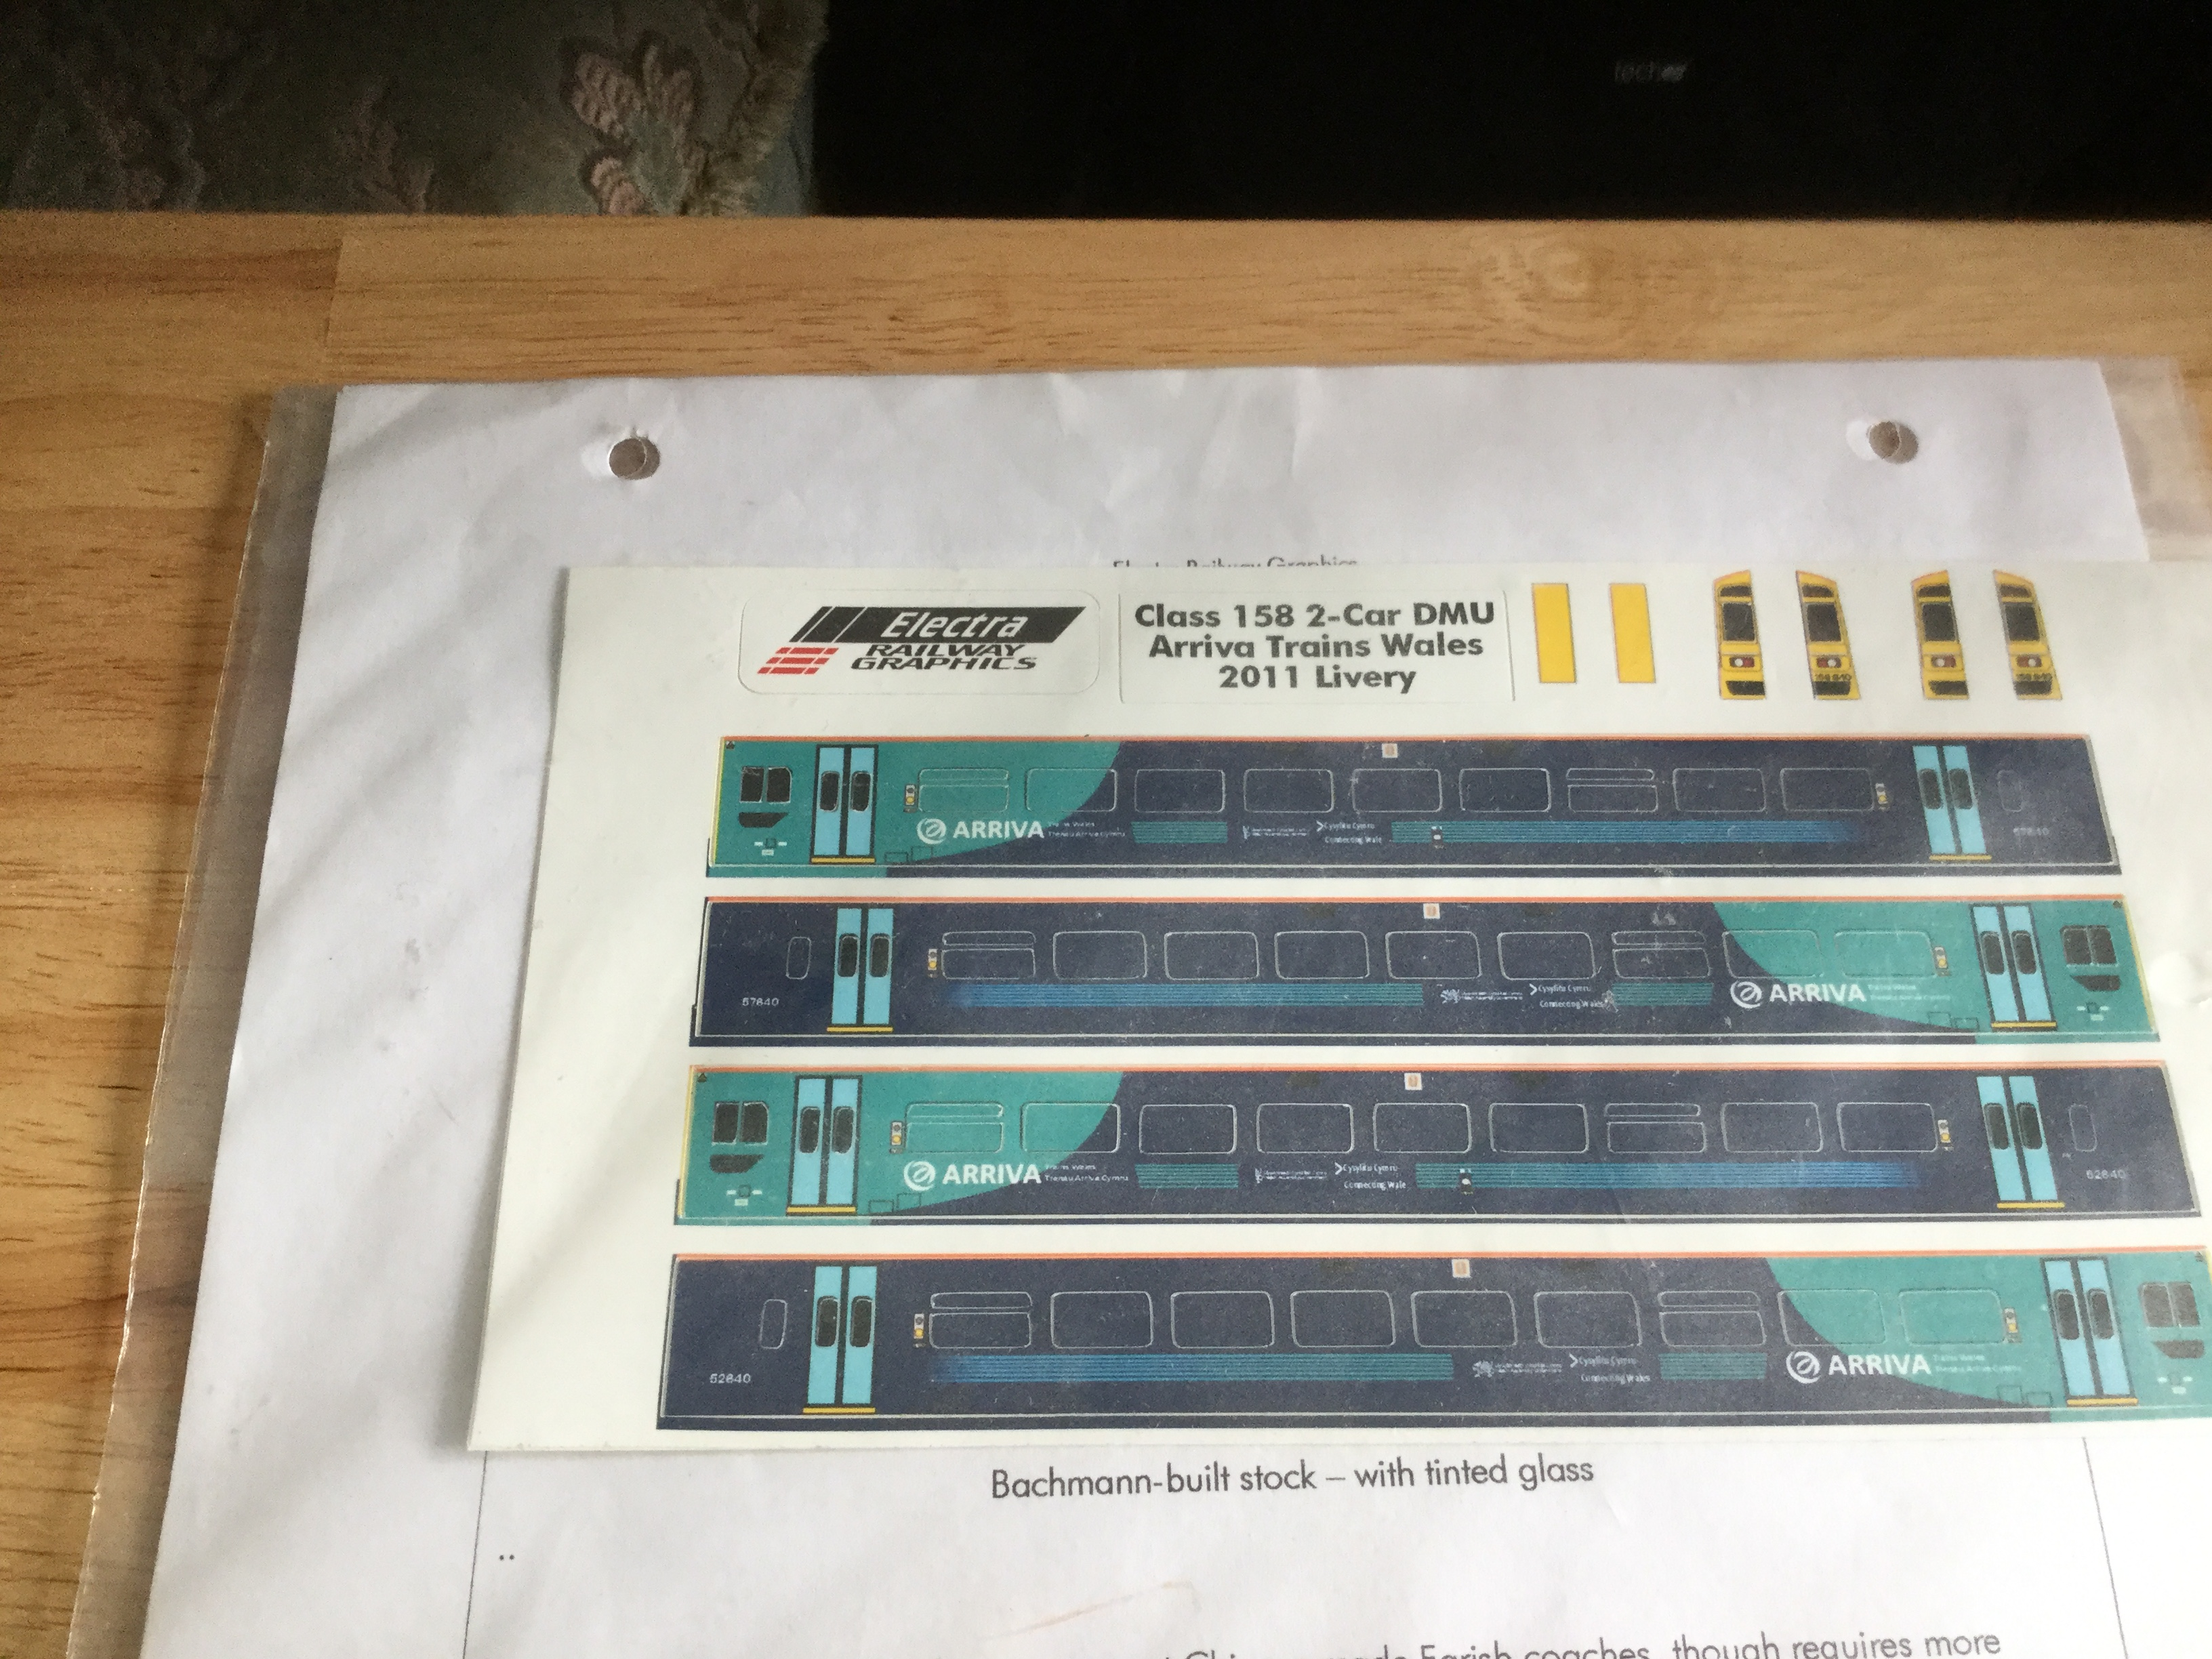 Electra Class 158 2-car DMU Arriva Trains Wales 2011 Livery